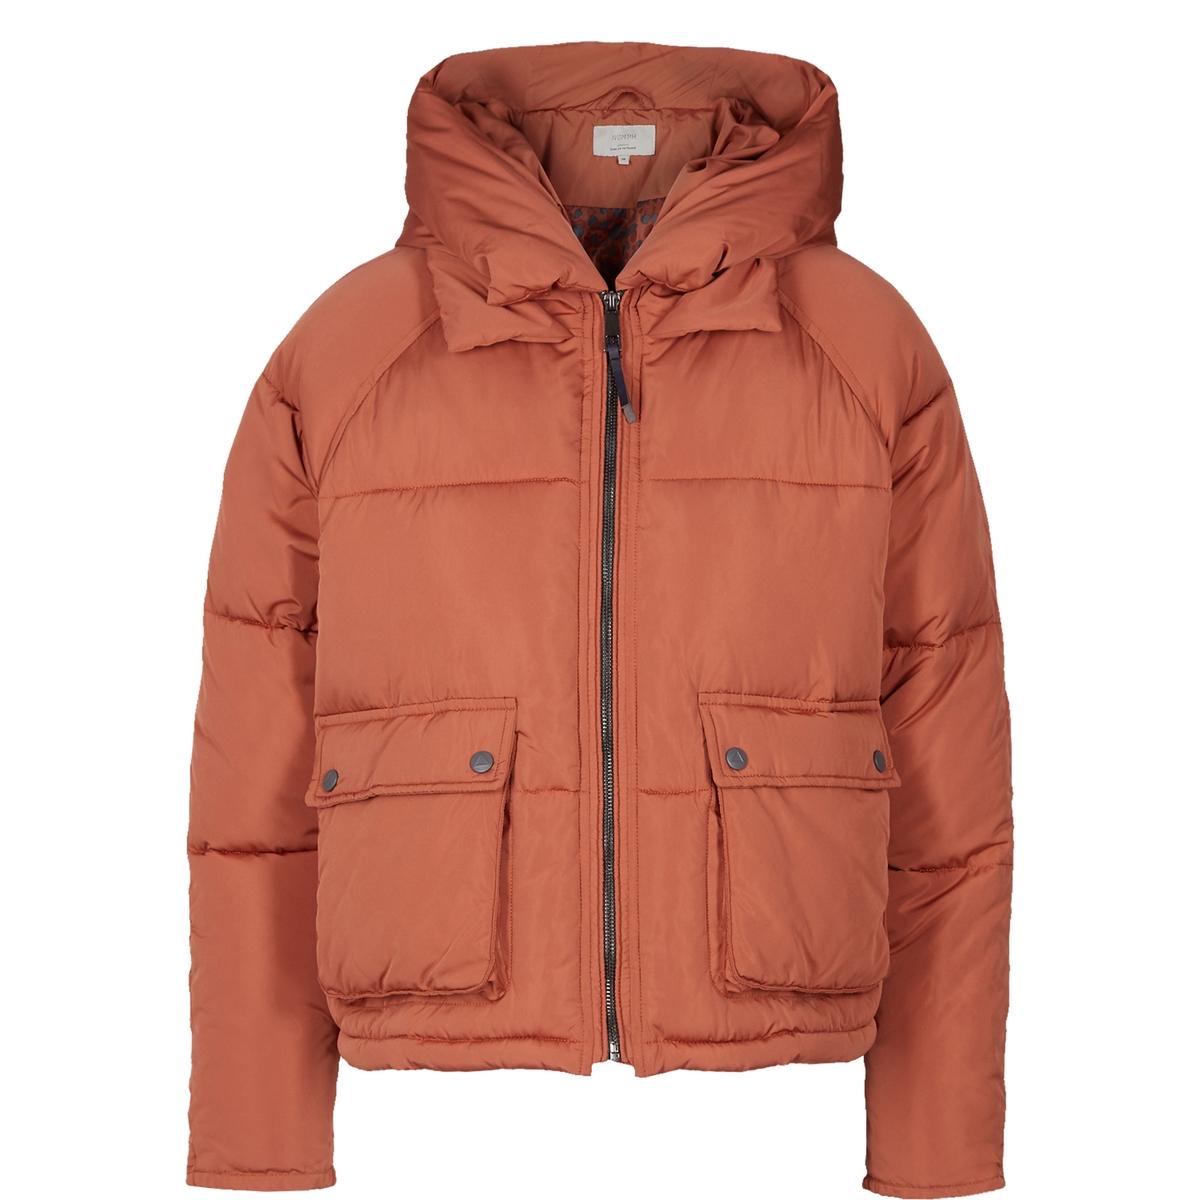 Куртка стеганая оверсайз